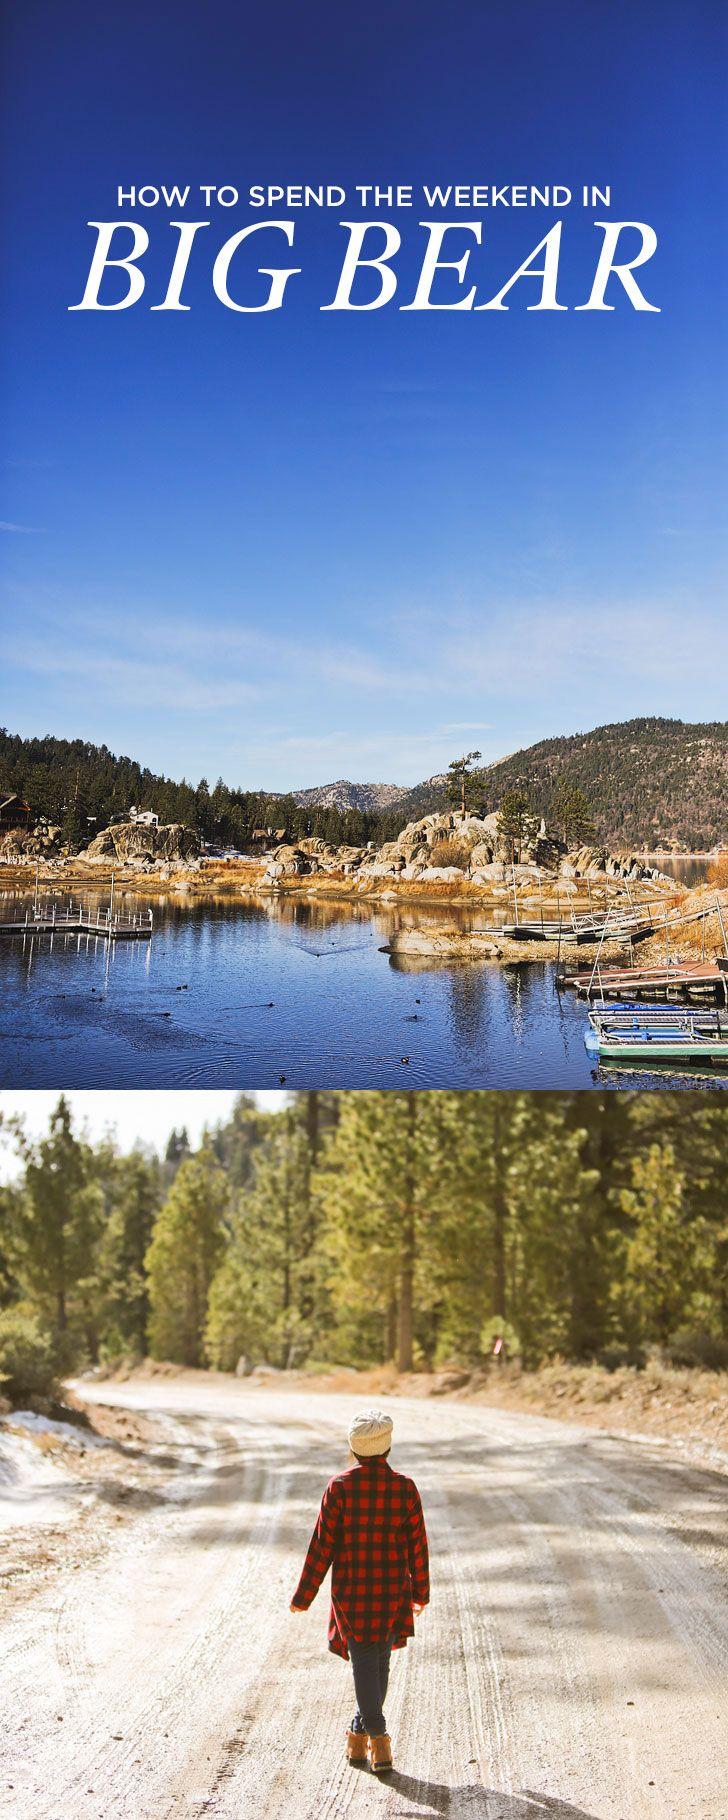 7 popular things to do in big bear lake california local rh pinterest co uk